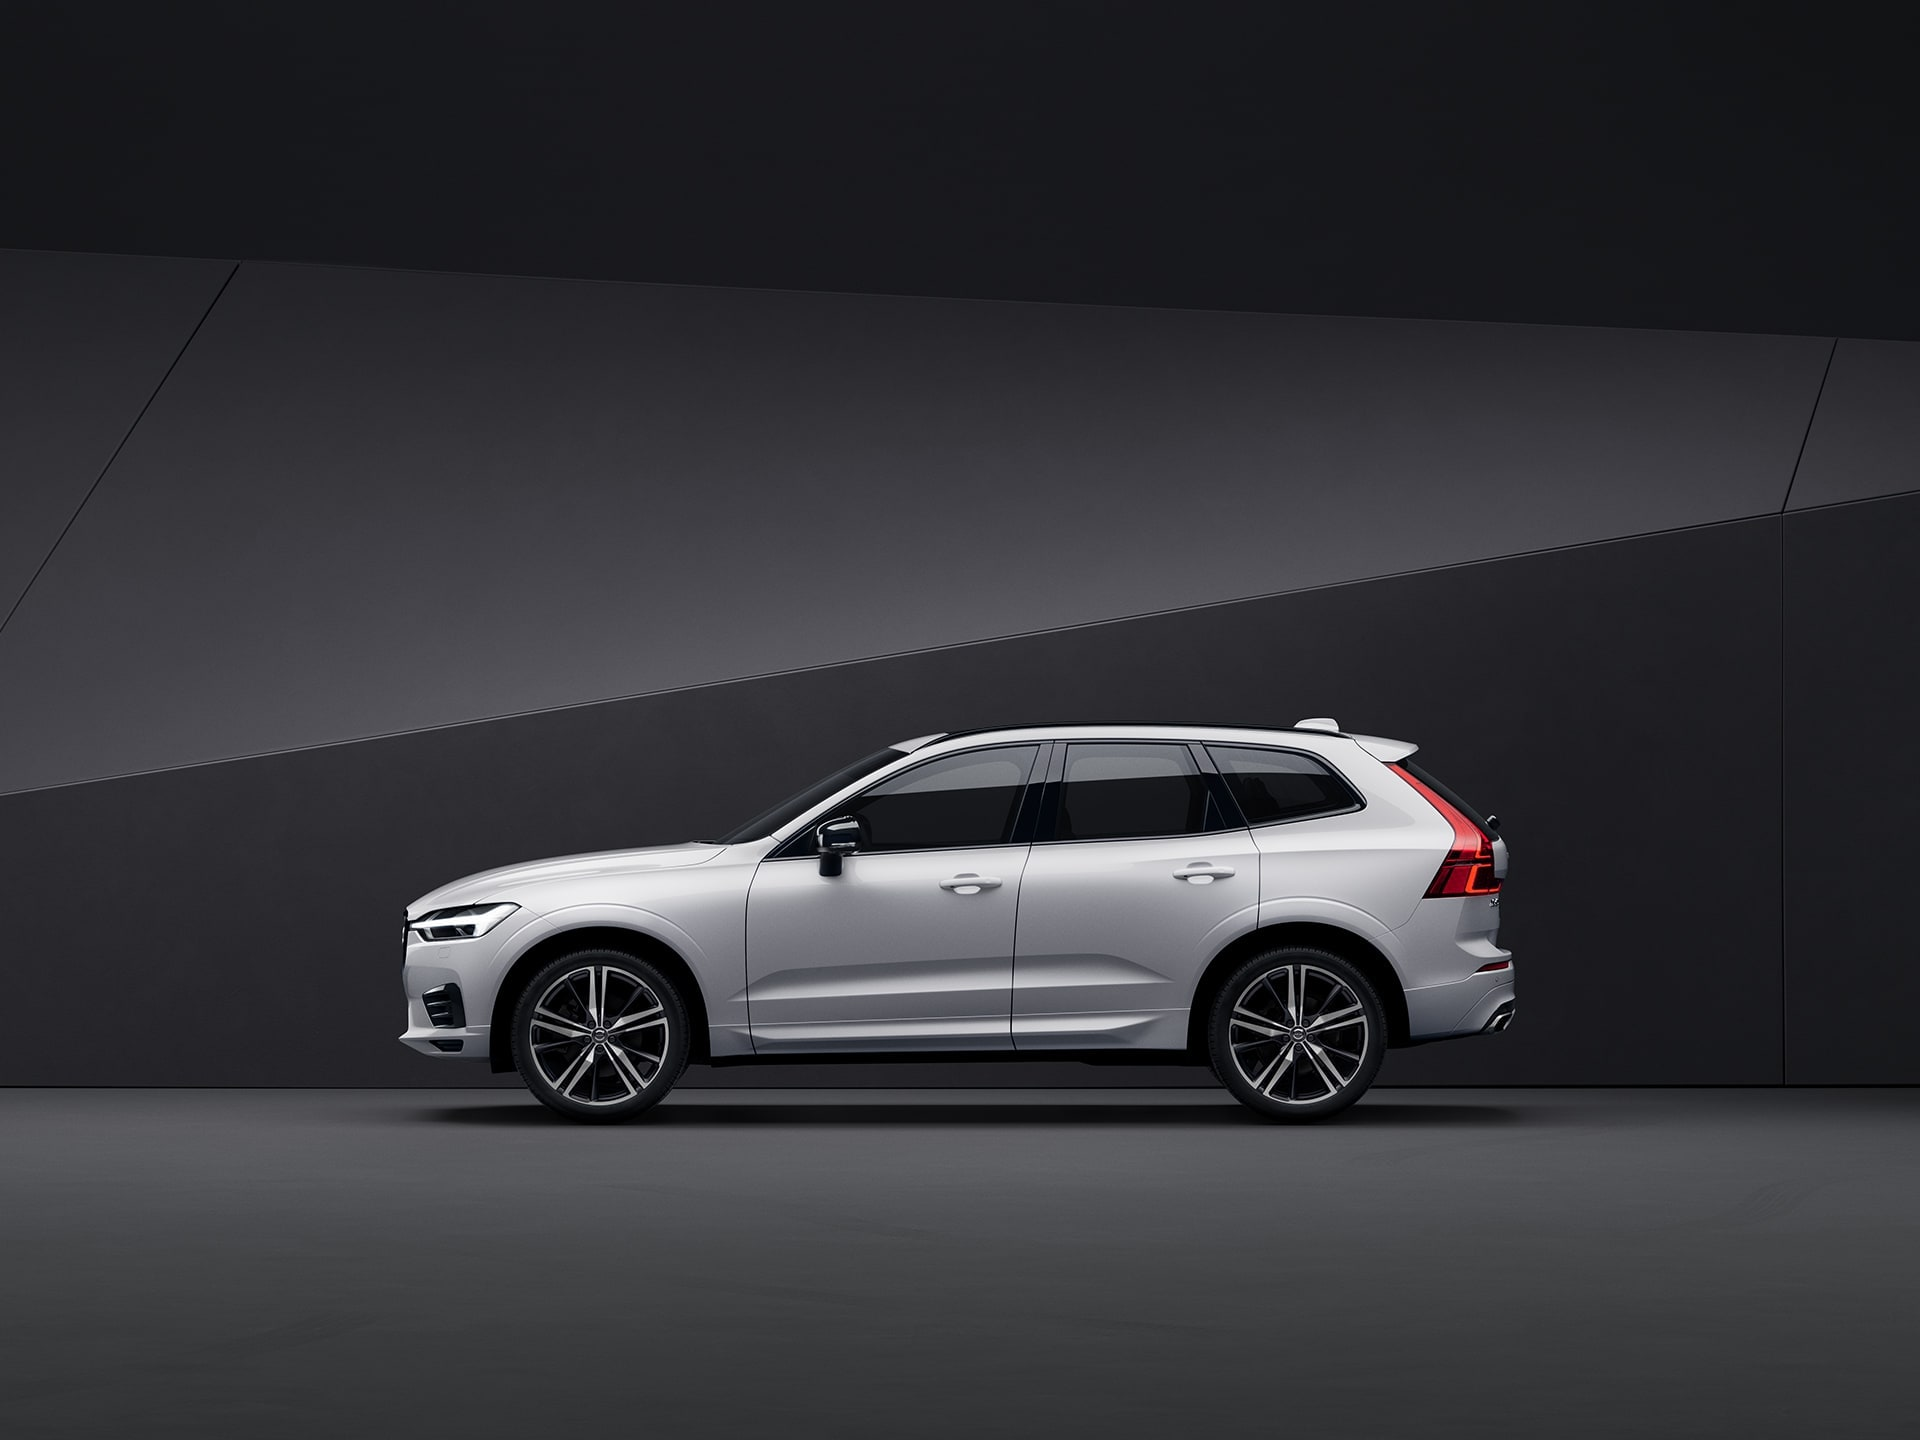 以黑色背景襯托的白色 Volvo XC60 SUV。